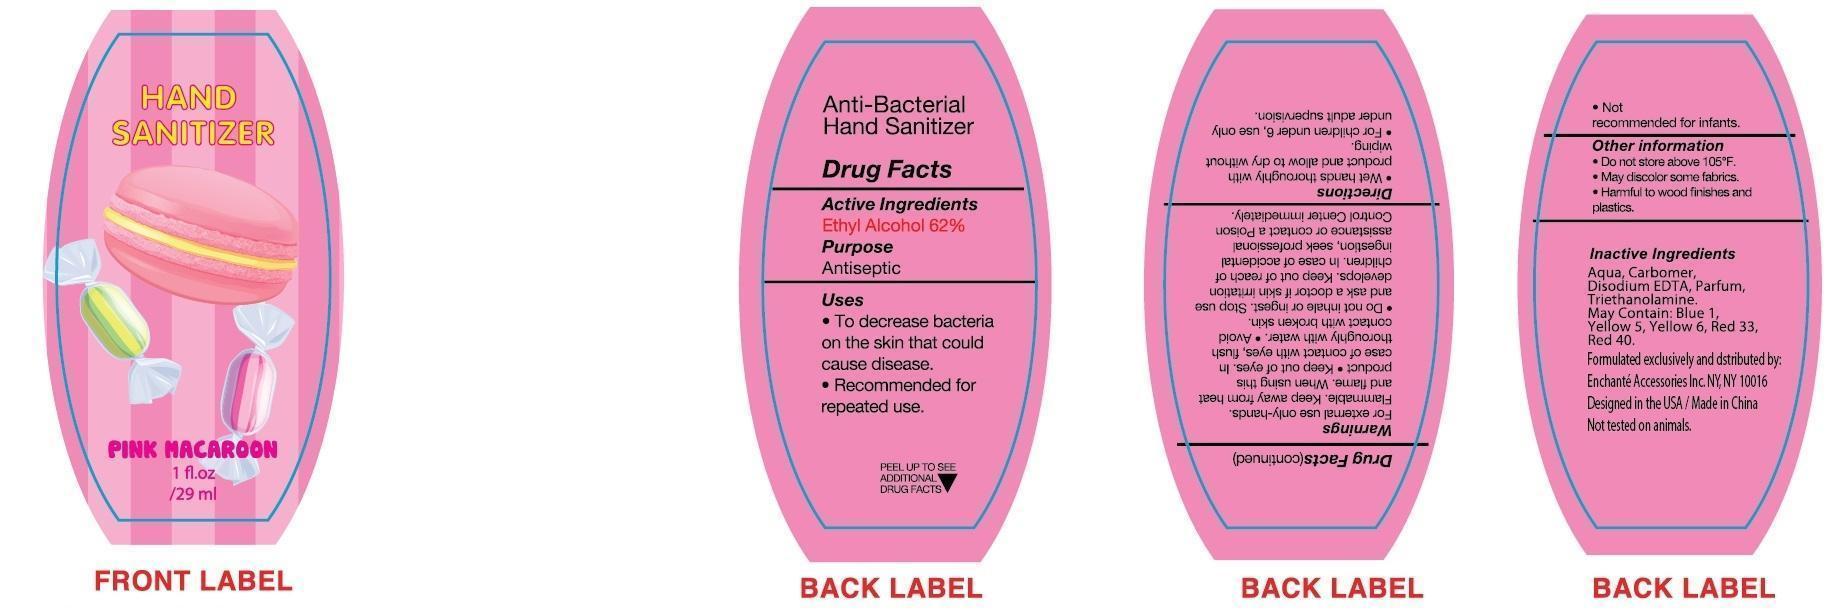 Pink Macaroon Hand Sanitizer (Alcohol) Liquid [Enchante Accessories Inc. ]